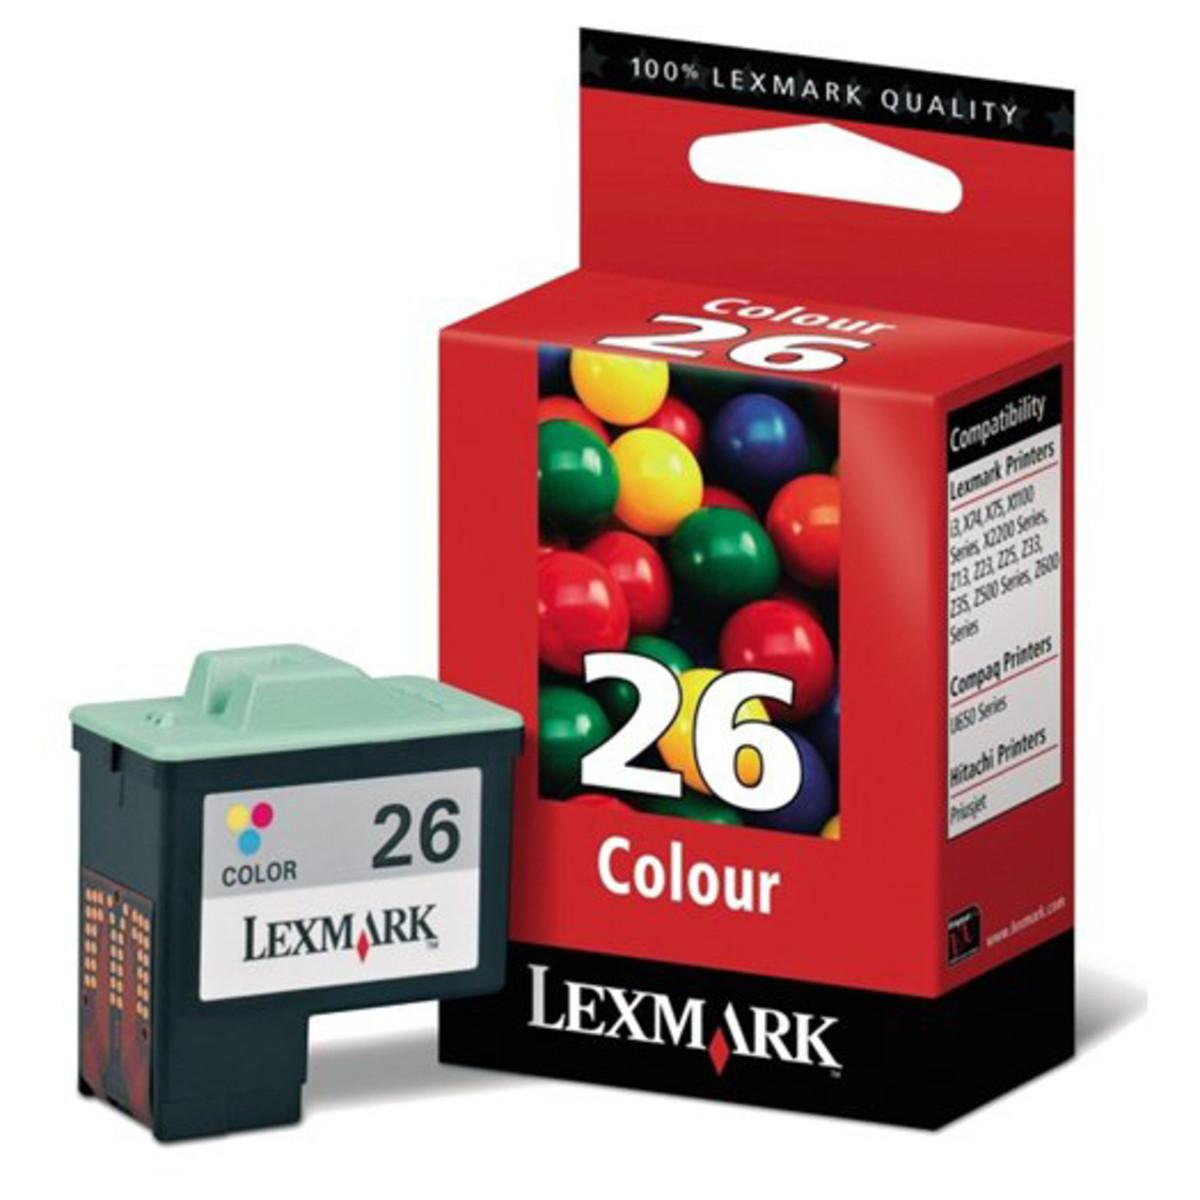 Lexmark 26 Black Colour Ink Cartridge